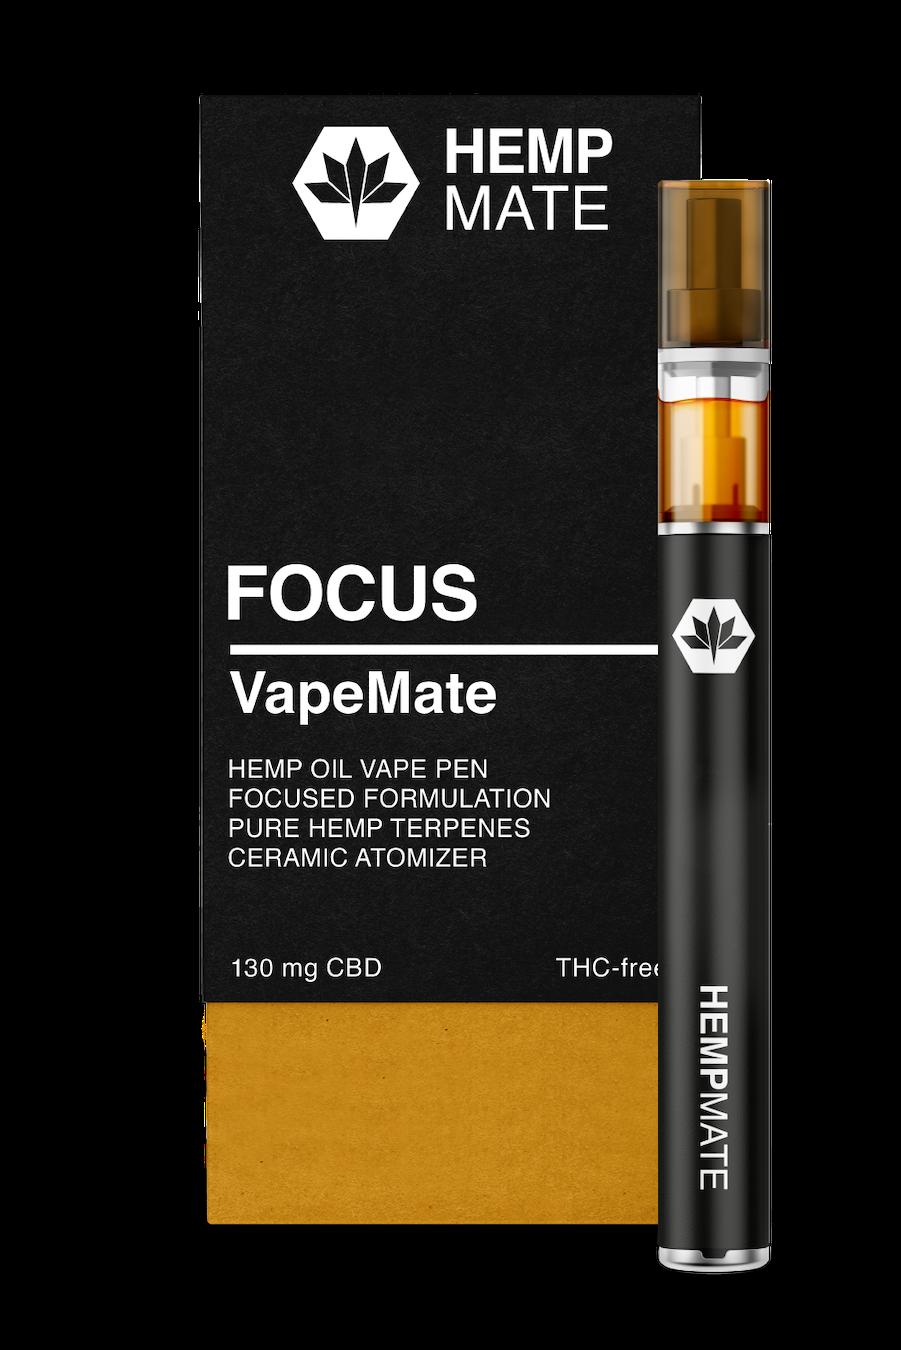 VapeMate Focus